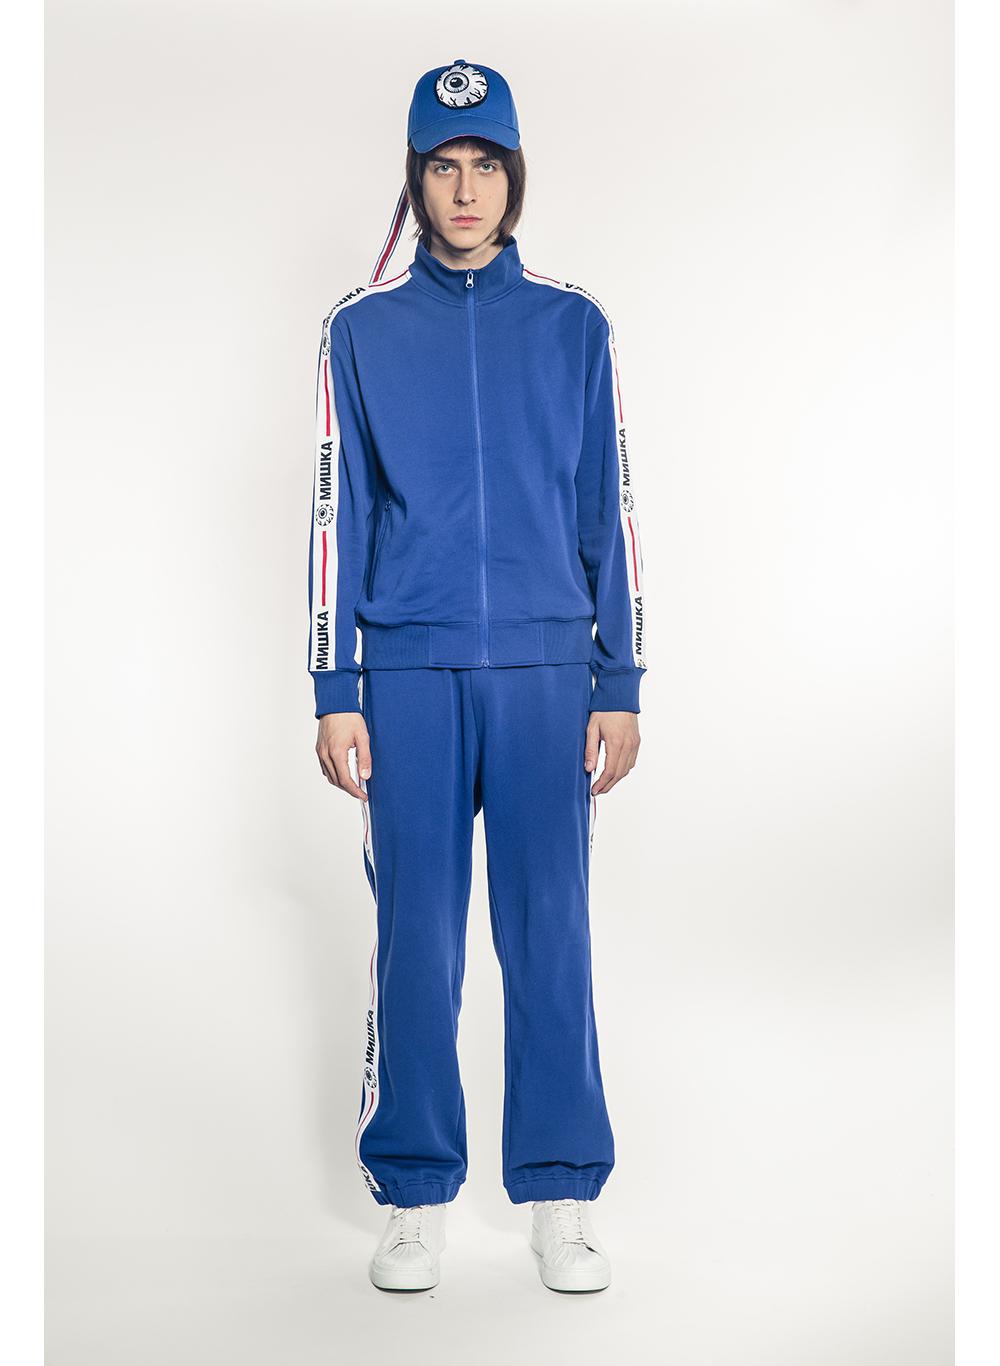 Cyrillic Stripe Fleece Jacket